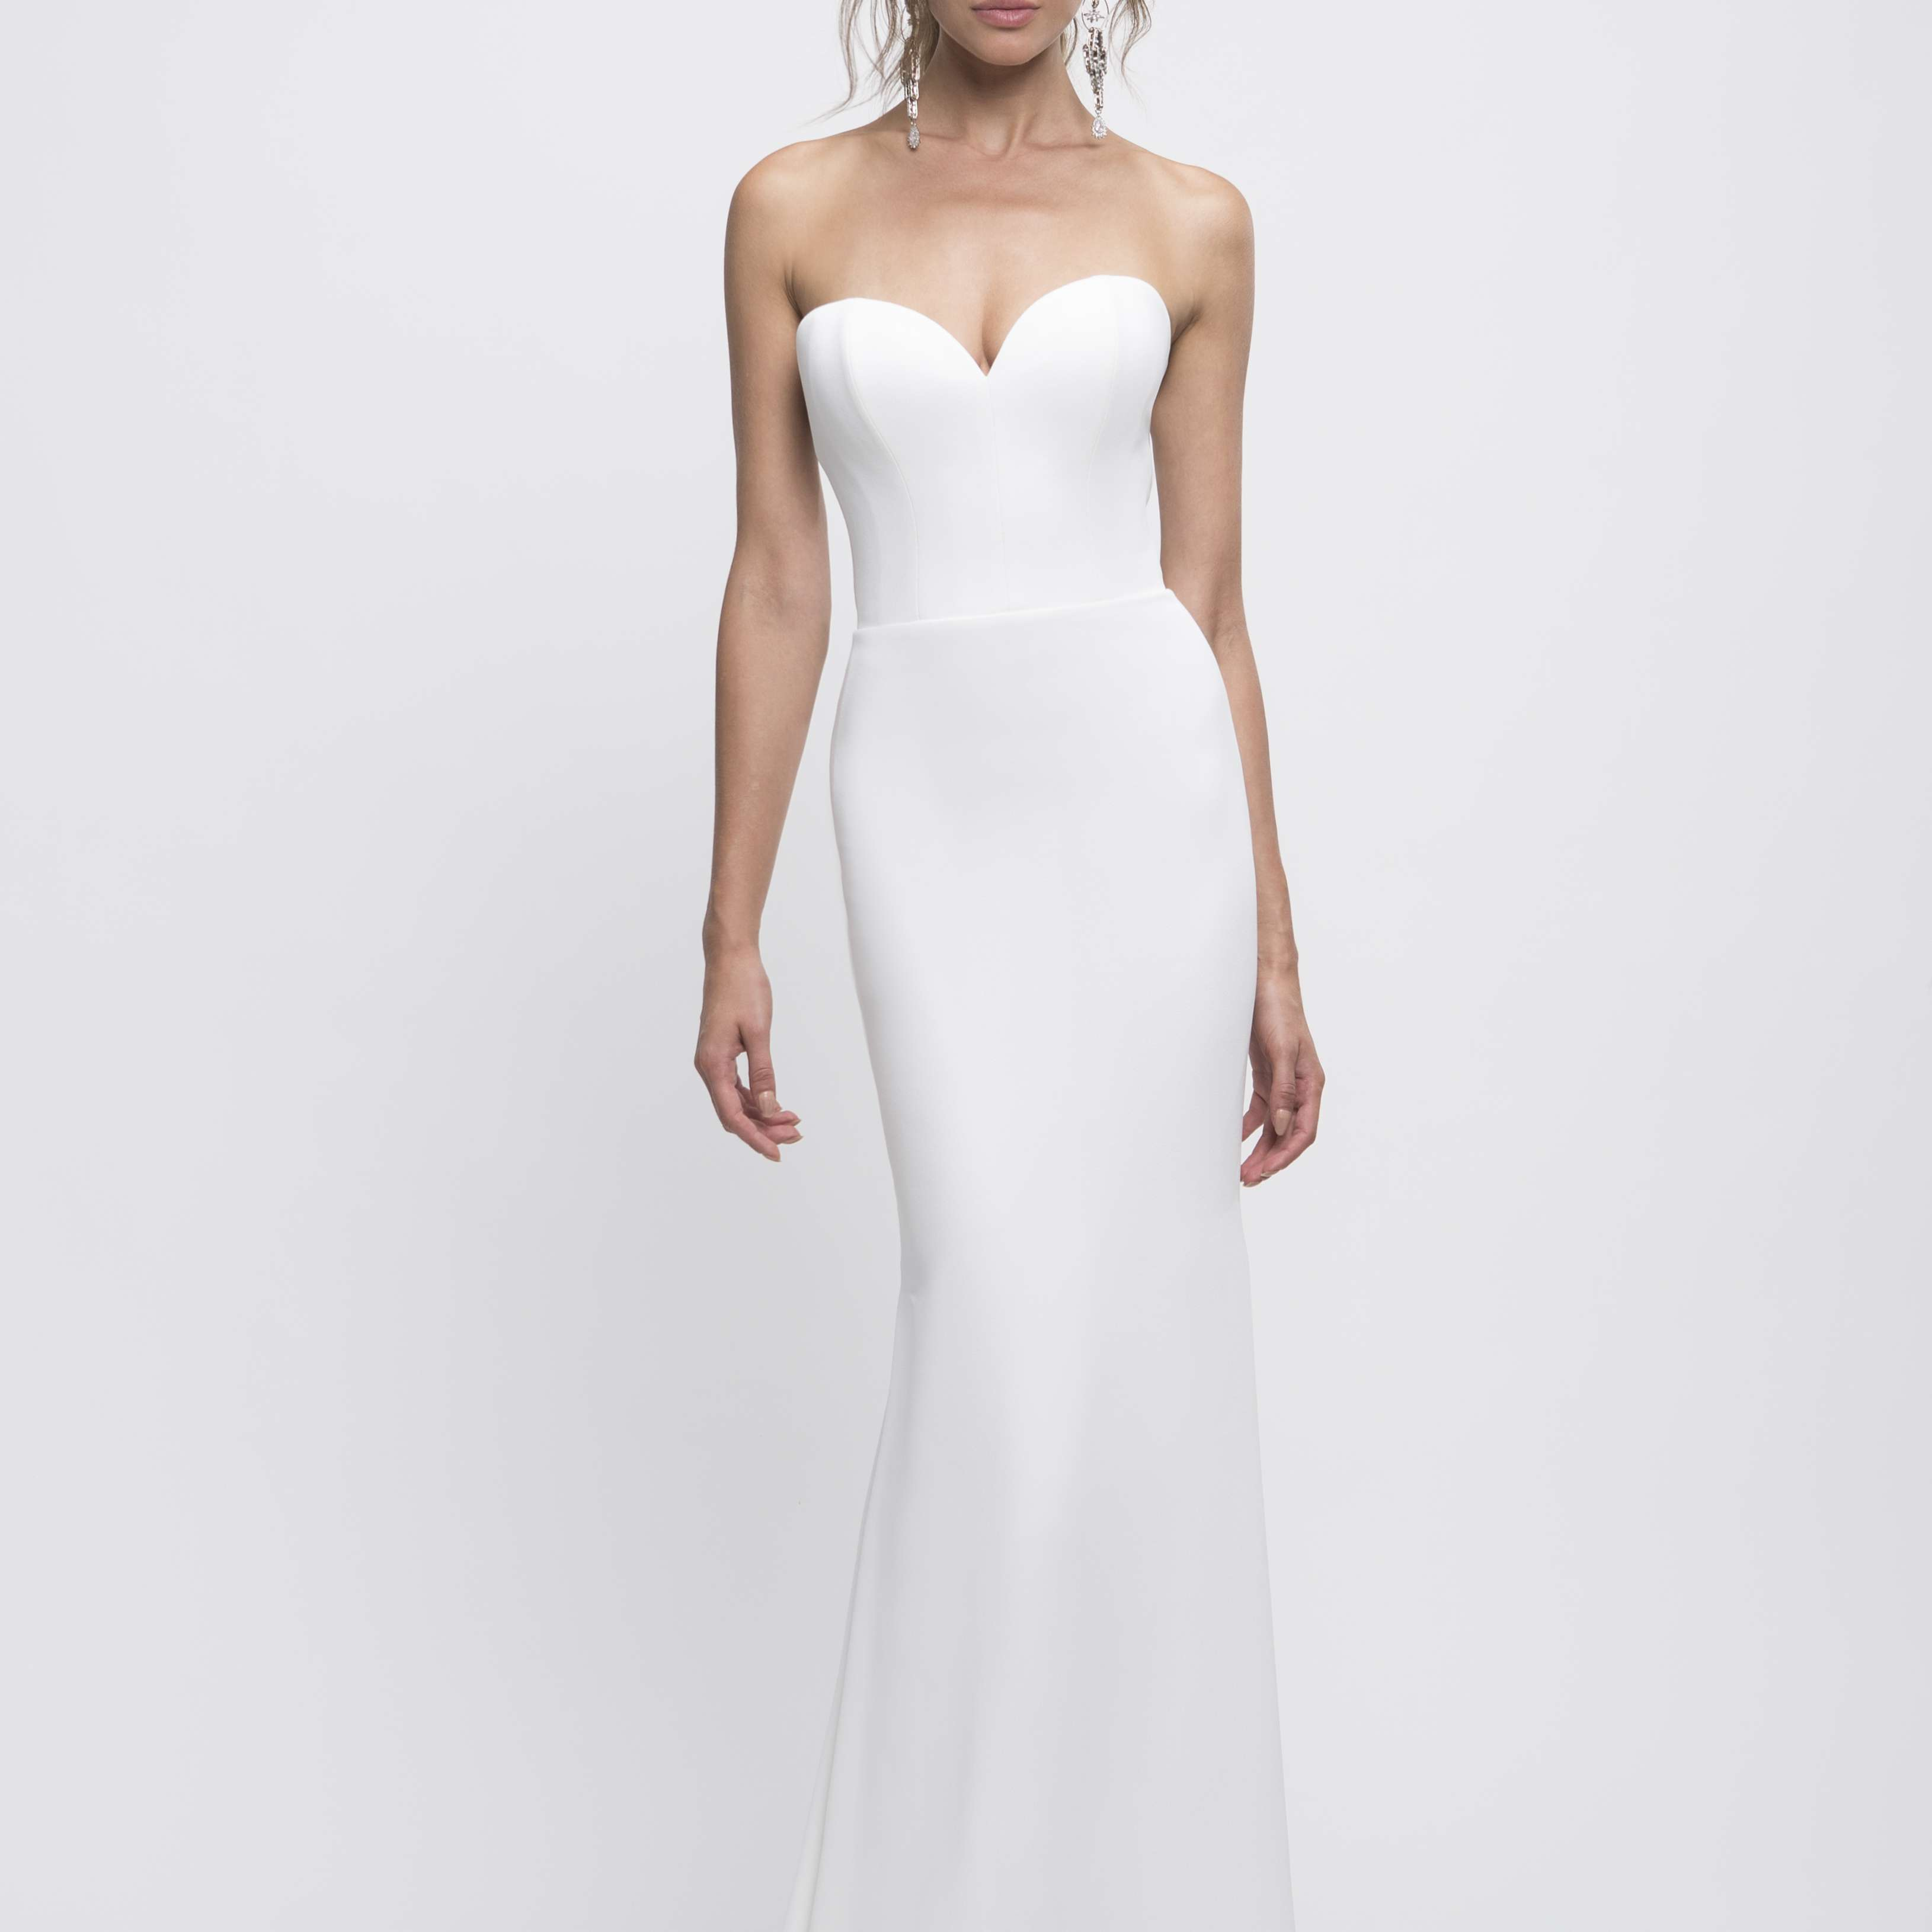 Brooklyn strapless wedding dress